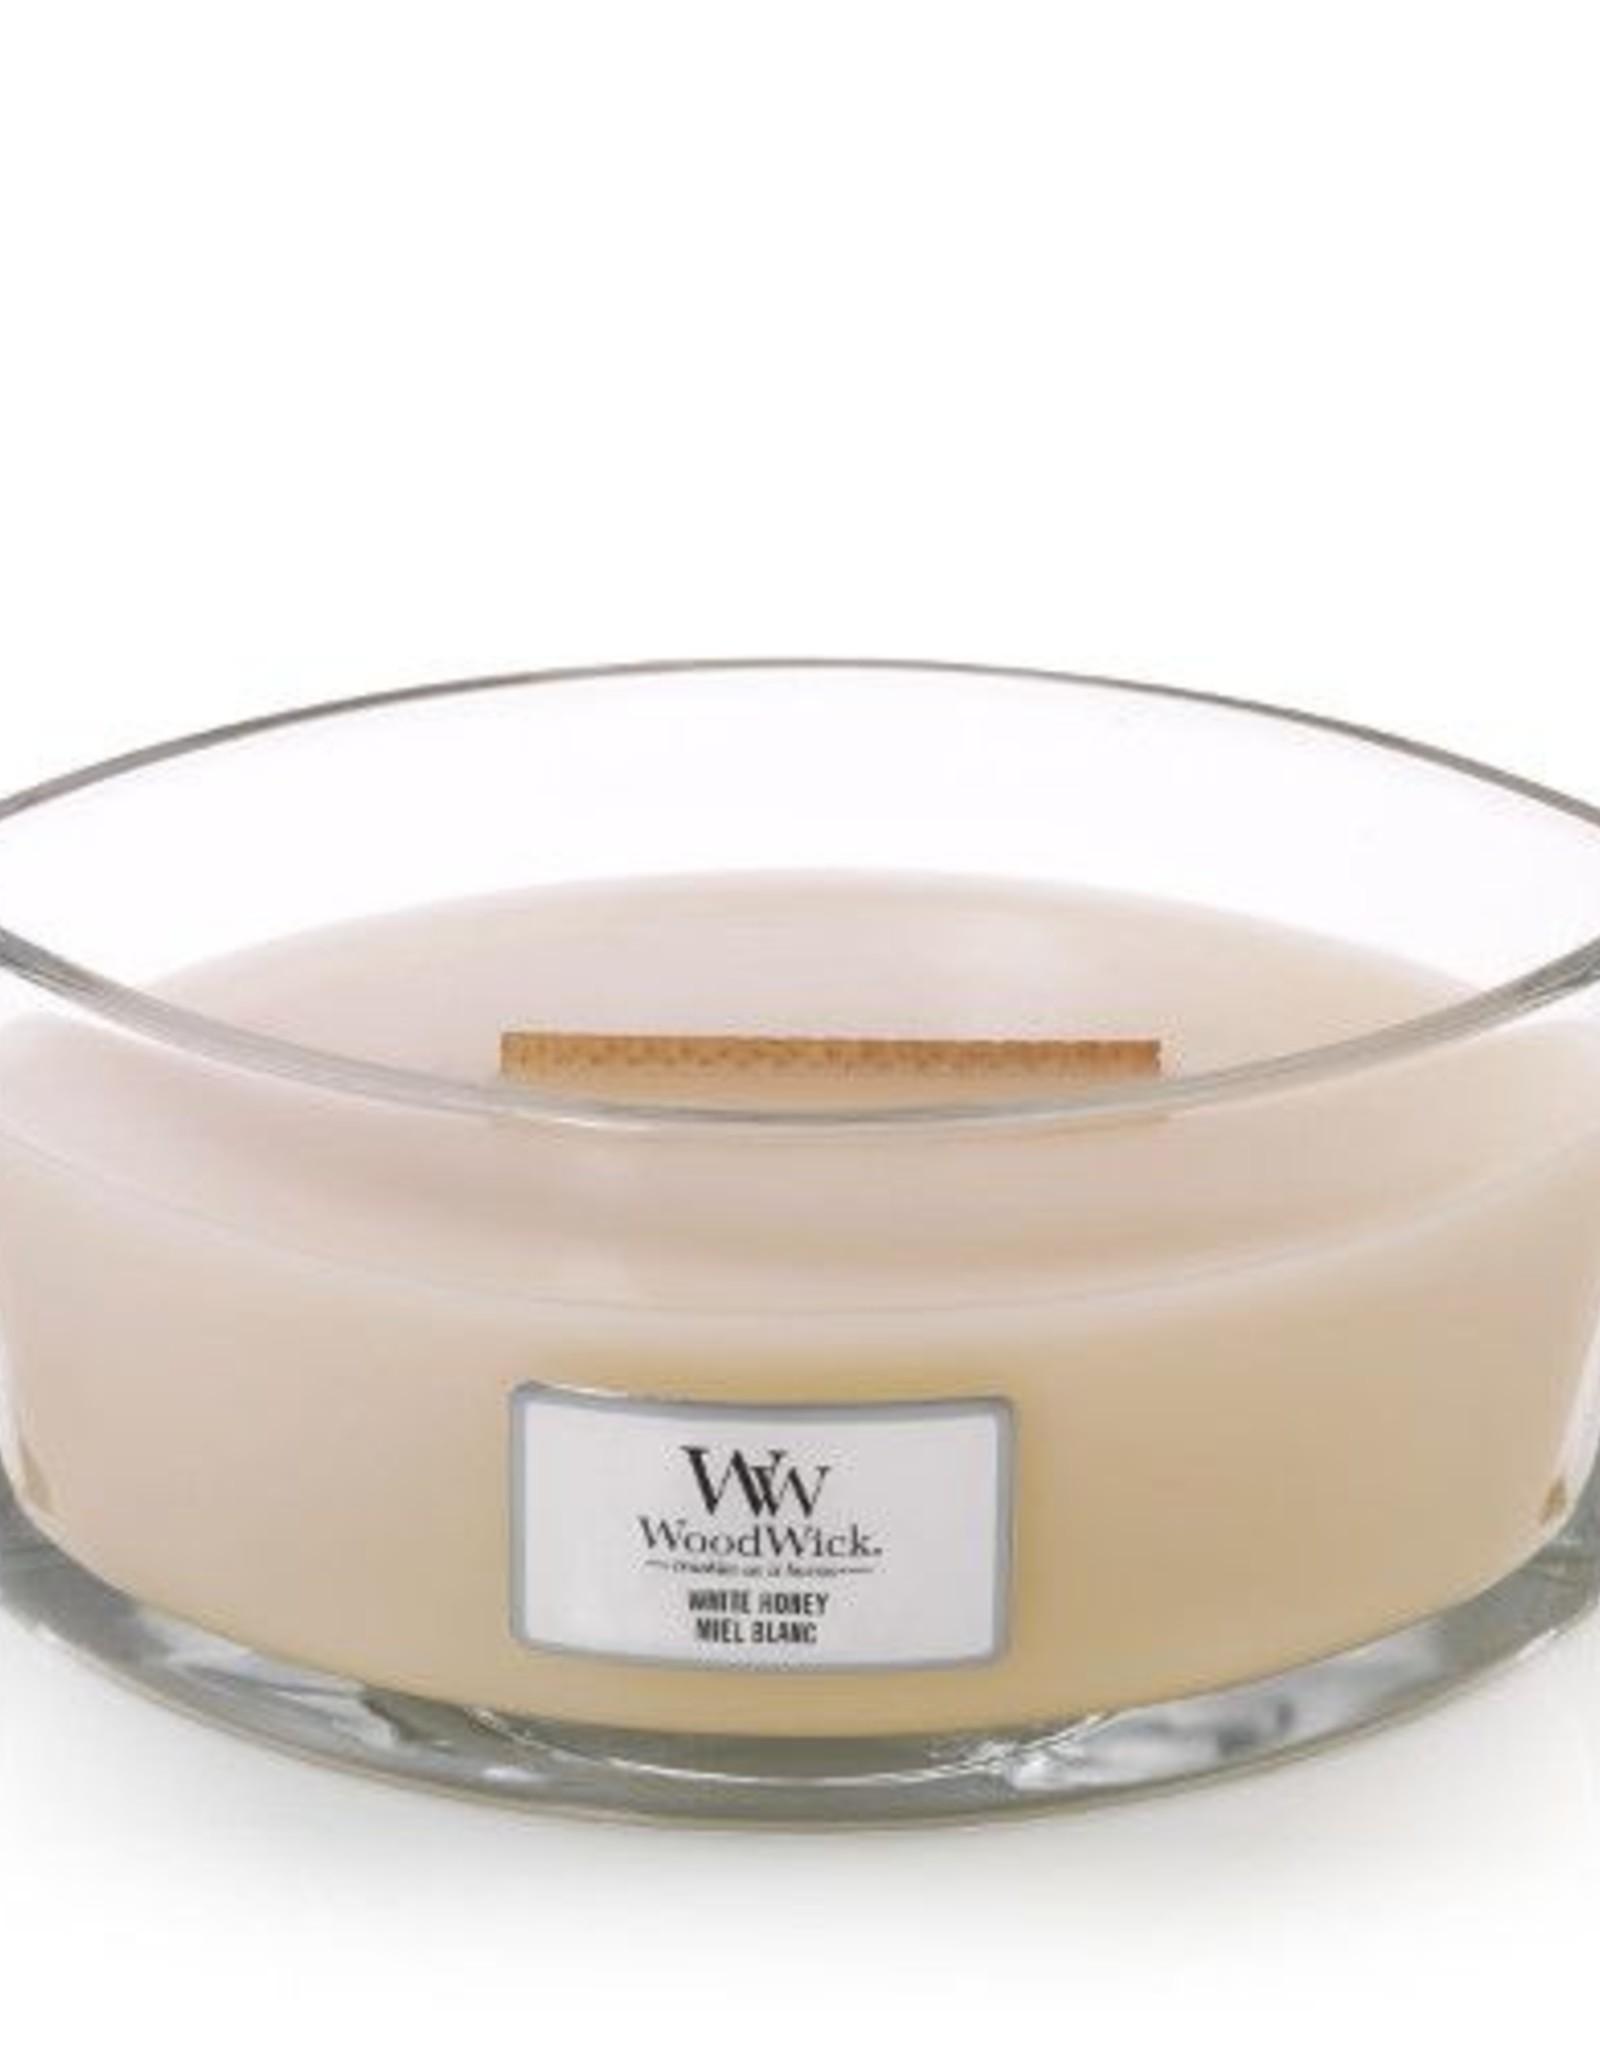 Woodwick Woodwick White Honey Ellipse Candle